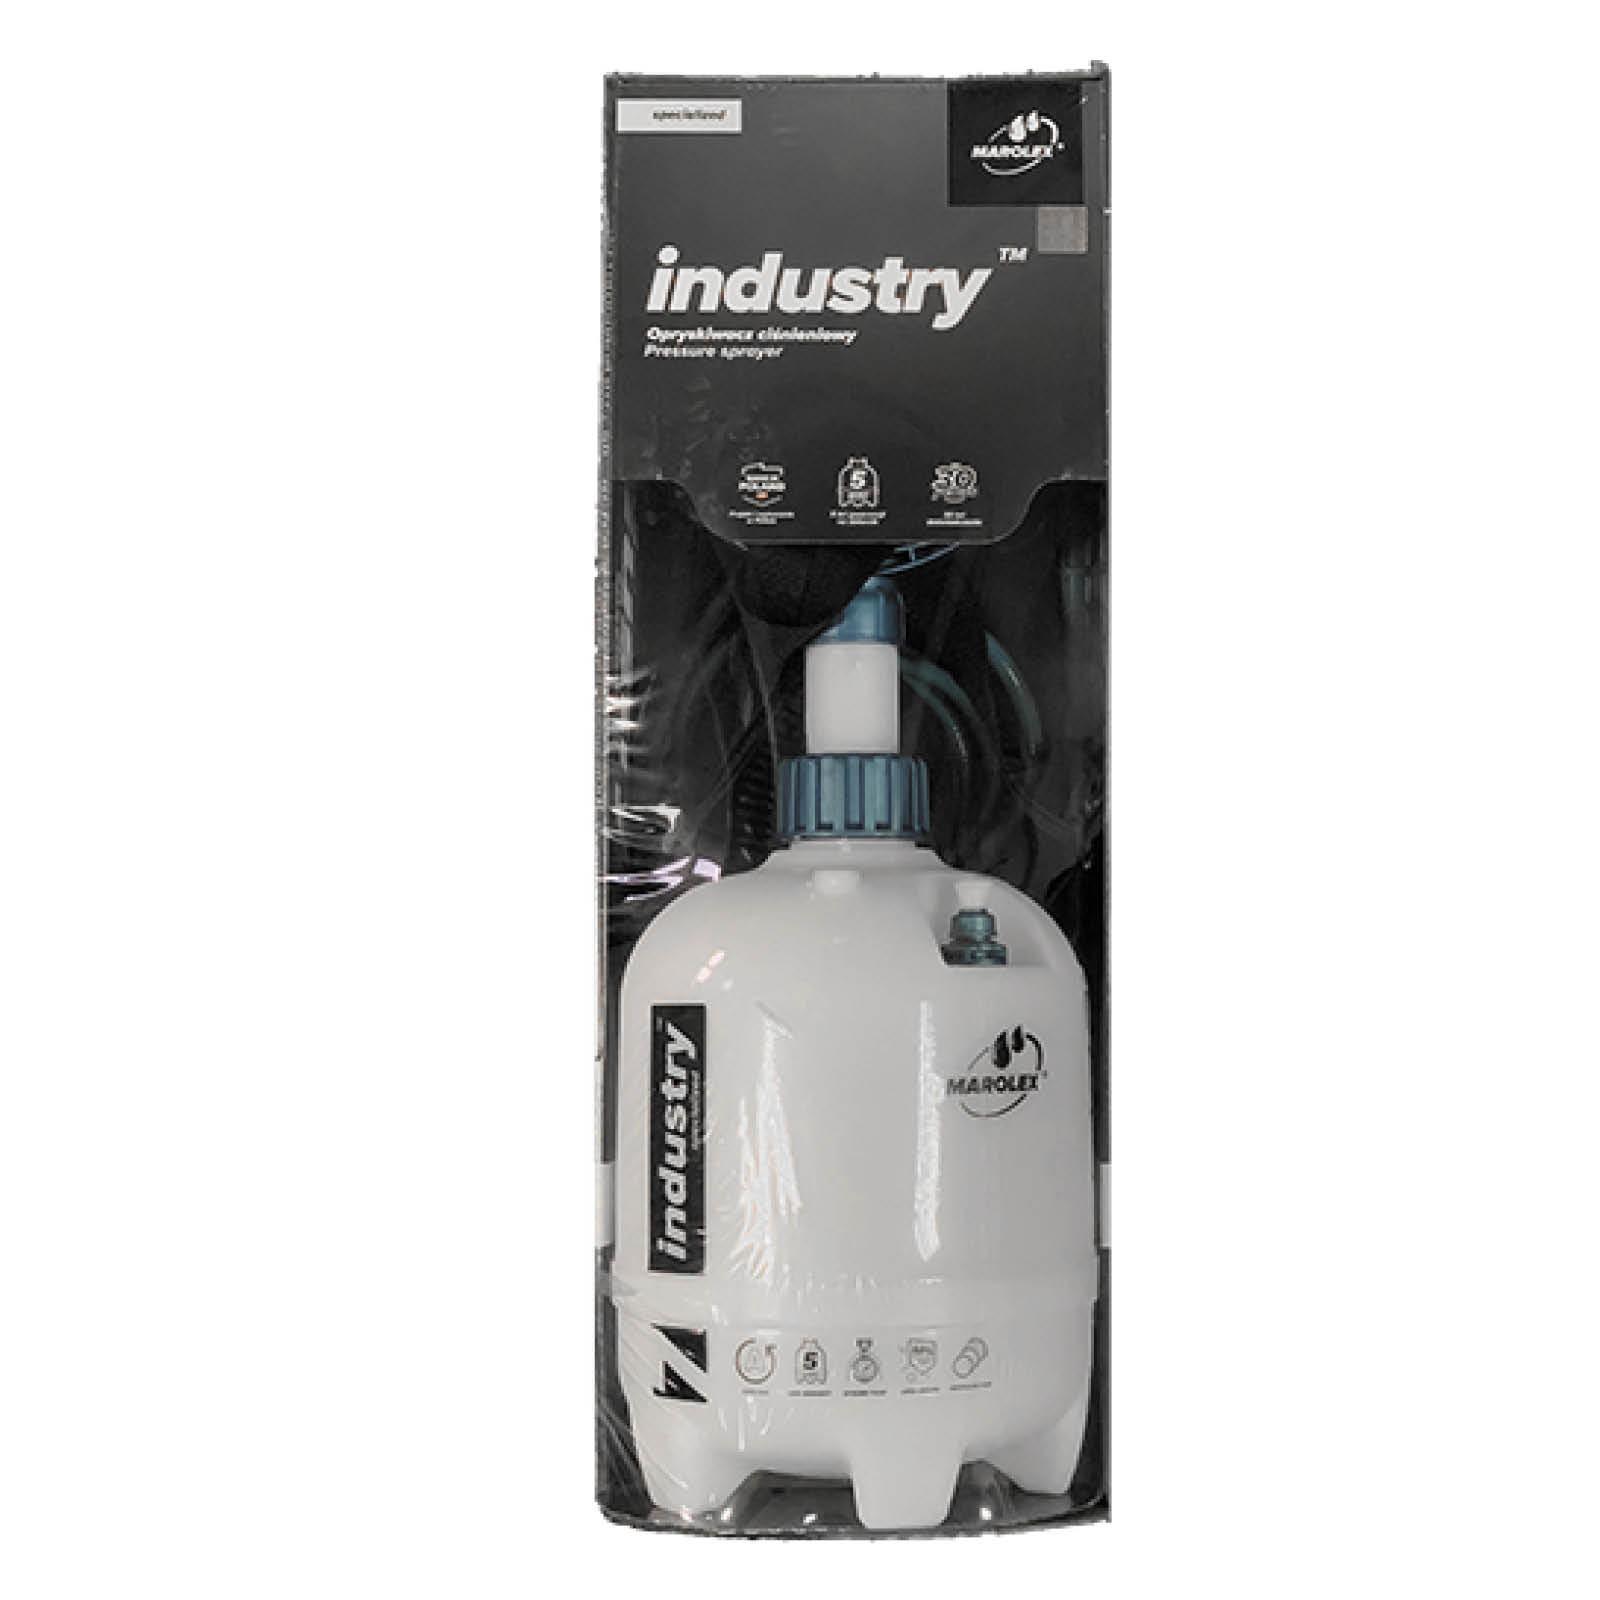 Marolex Industry EPDM Alkaline drukpomp 7 liter